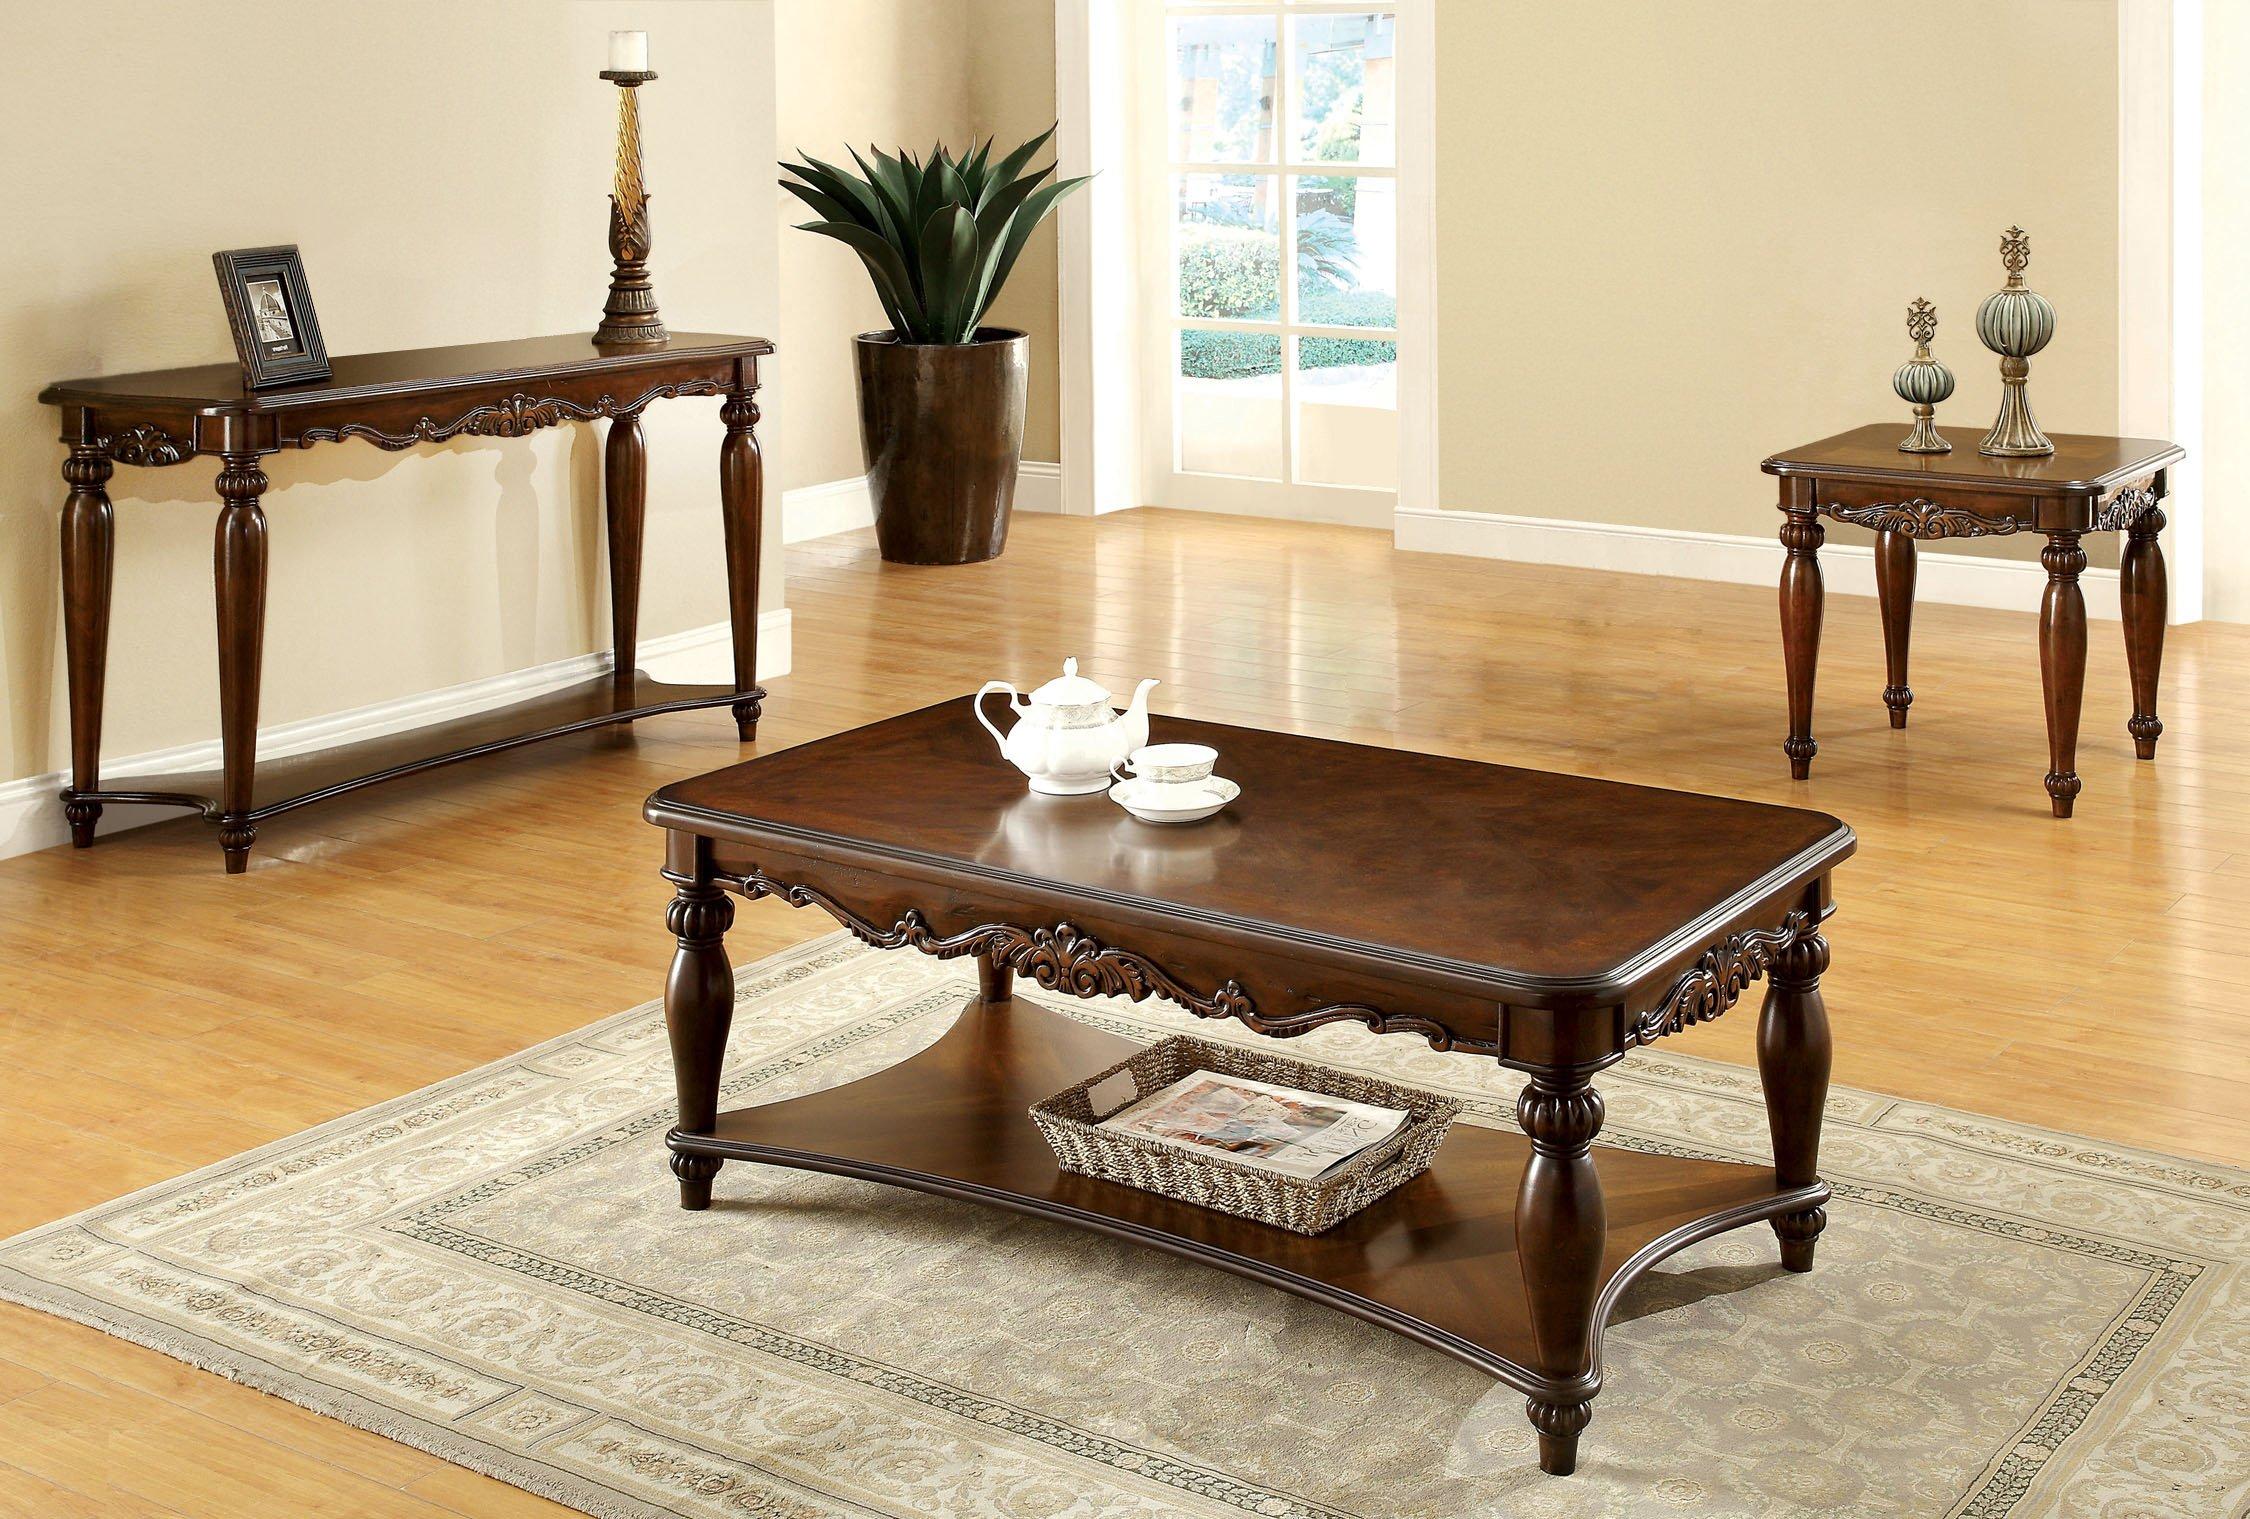 Furniture of America 3-Piece Trenton Table Set, Cherry Finish